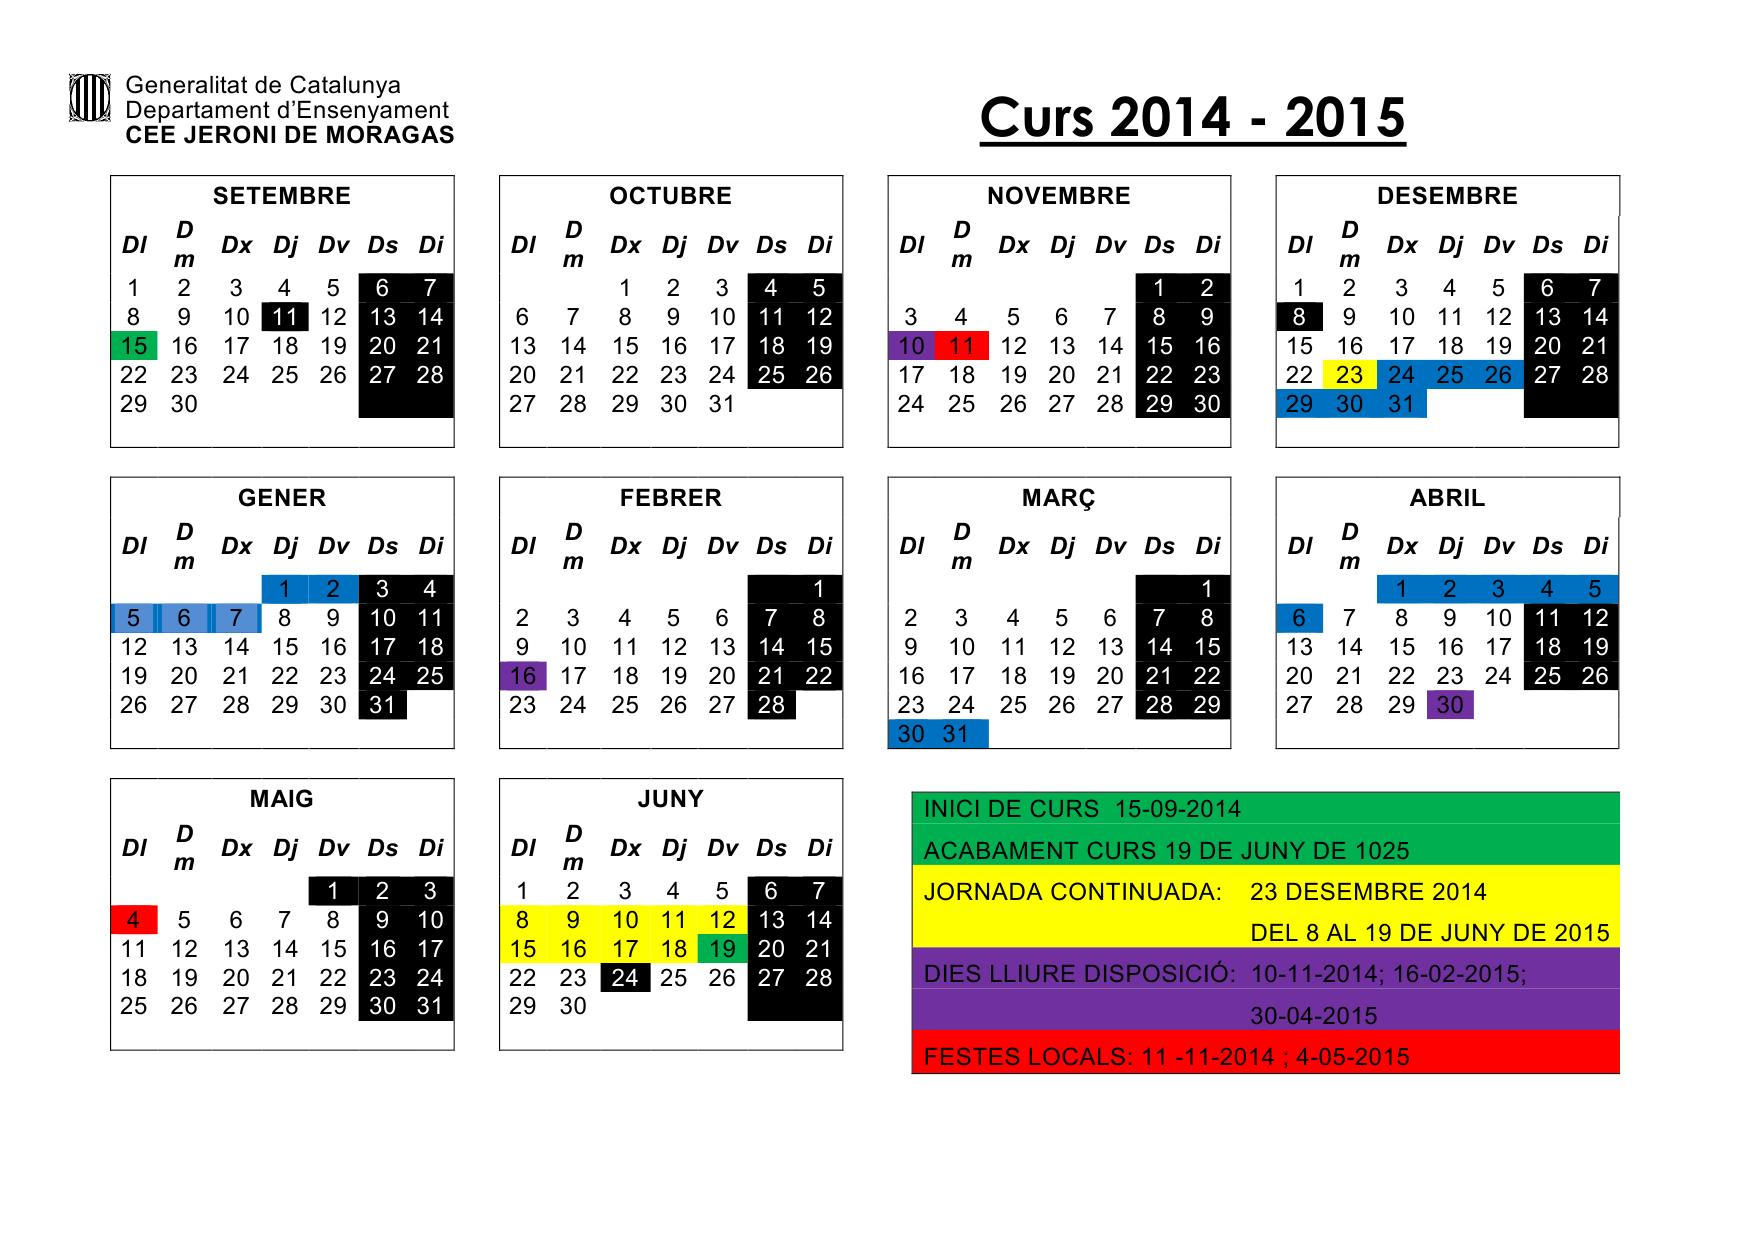 Calendari 2014-2015 COMPLERT_0001 - copia